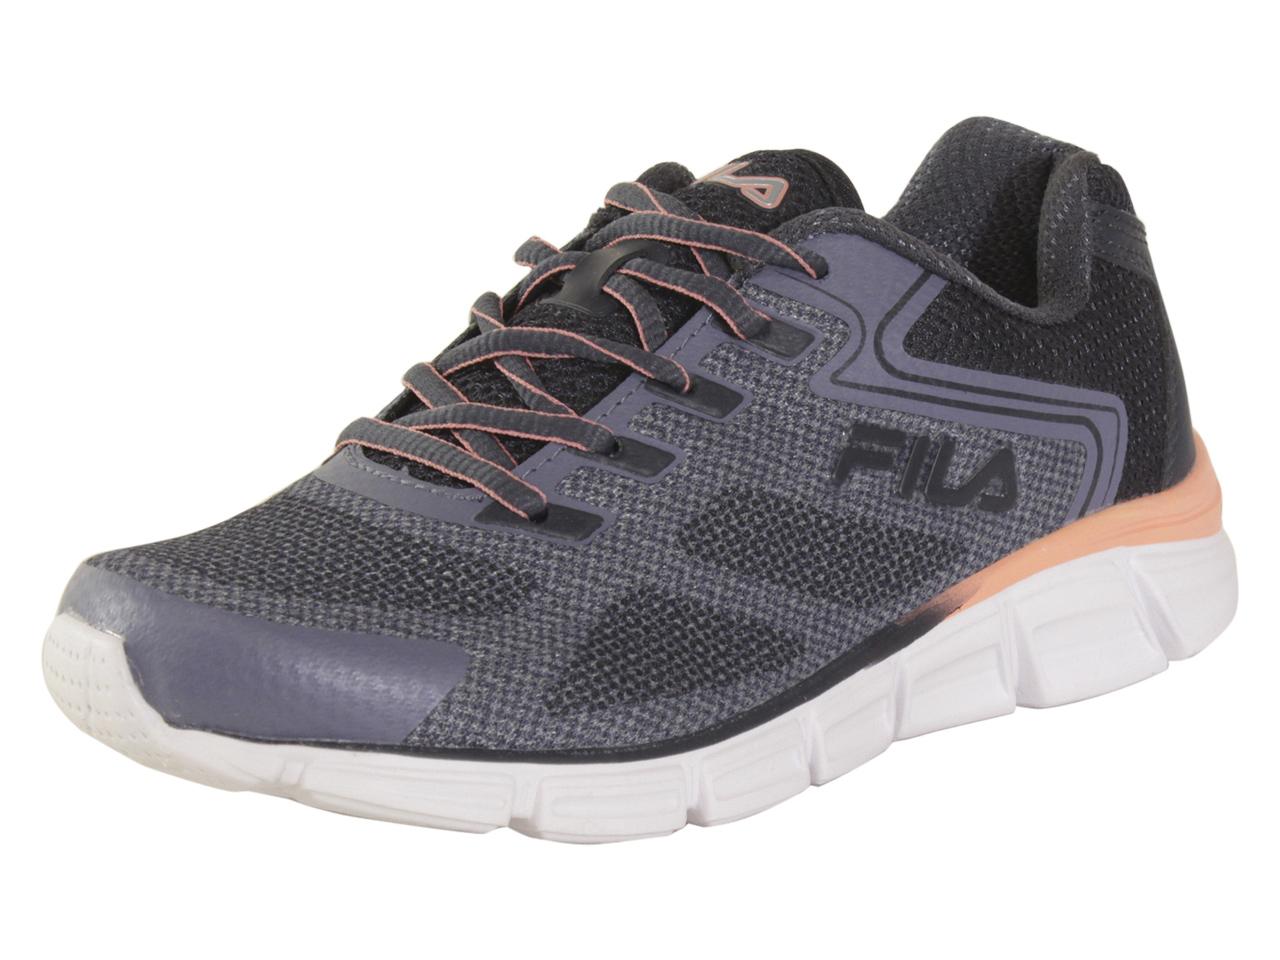 Details about Fila Women's Memory Exolize GreyBlue Memory Foam Running Sneakers Shoes